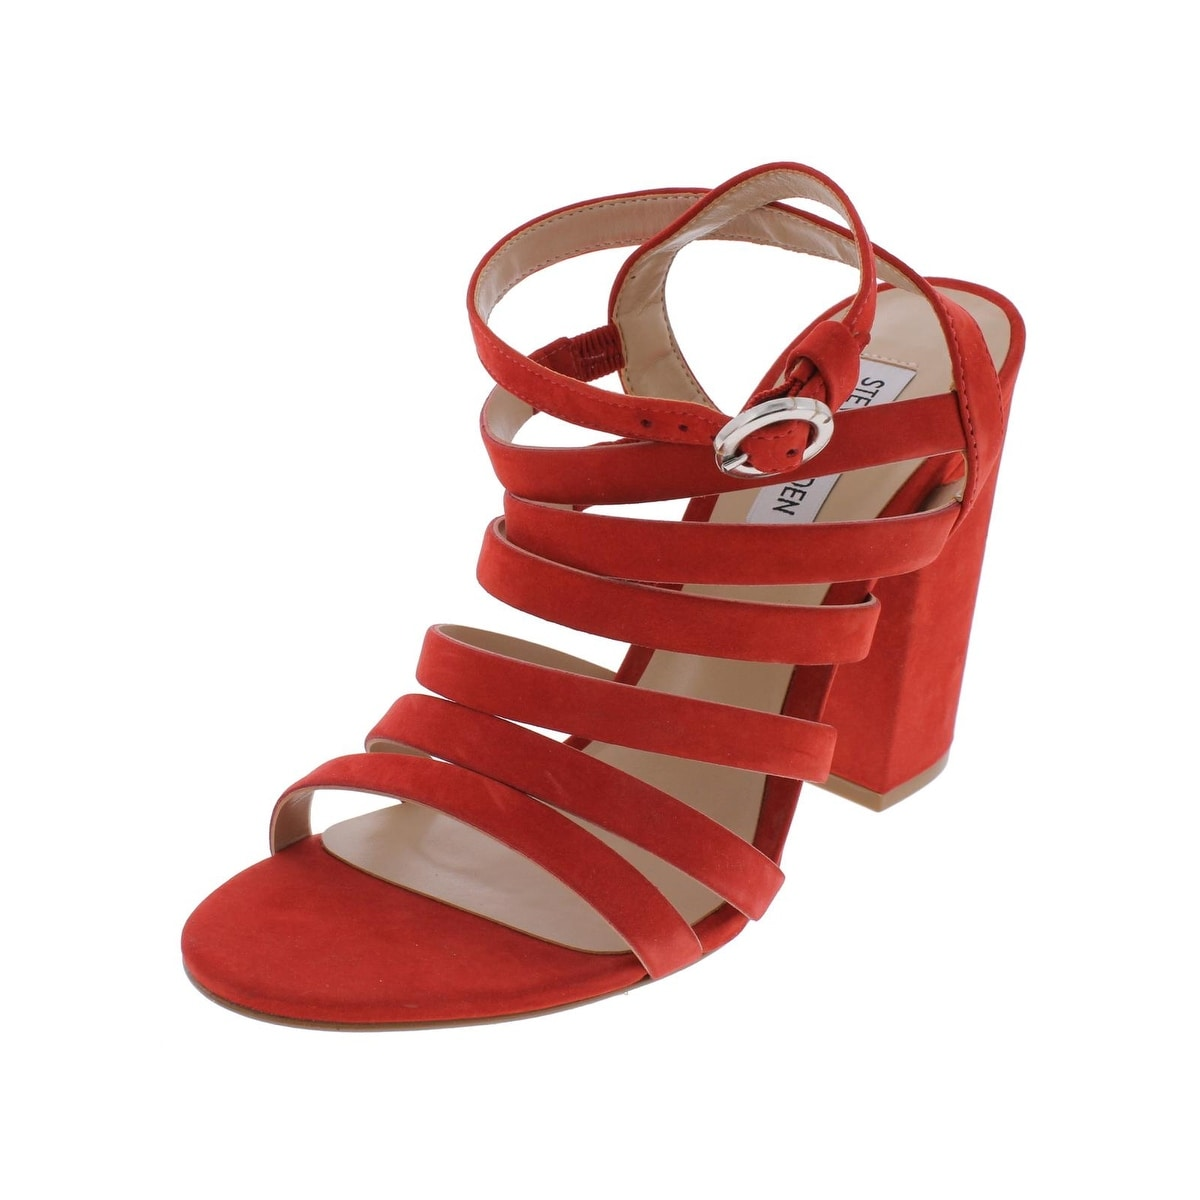 a925db04e17 Steve Madden Womens Saturn Dress Sandals Open Toe Strappy